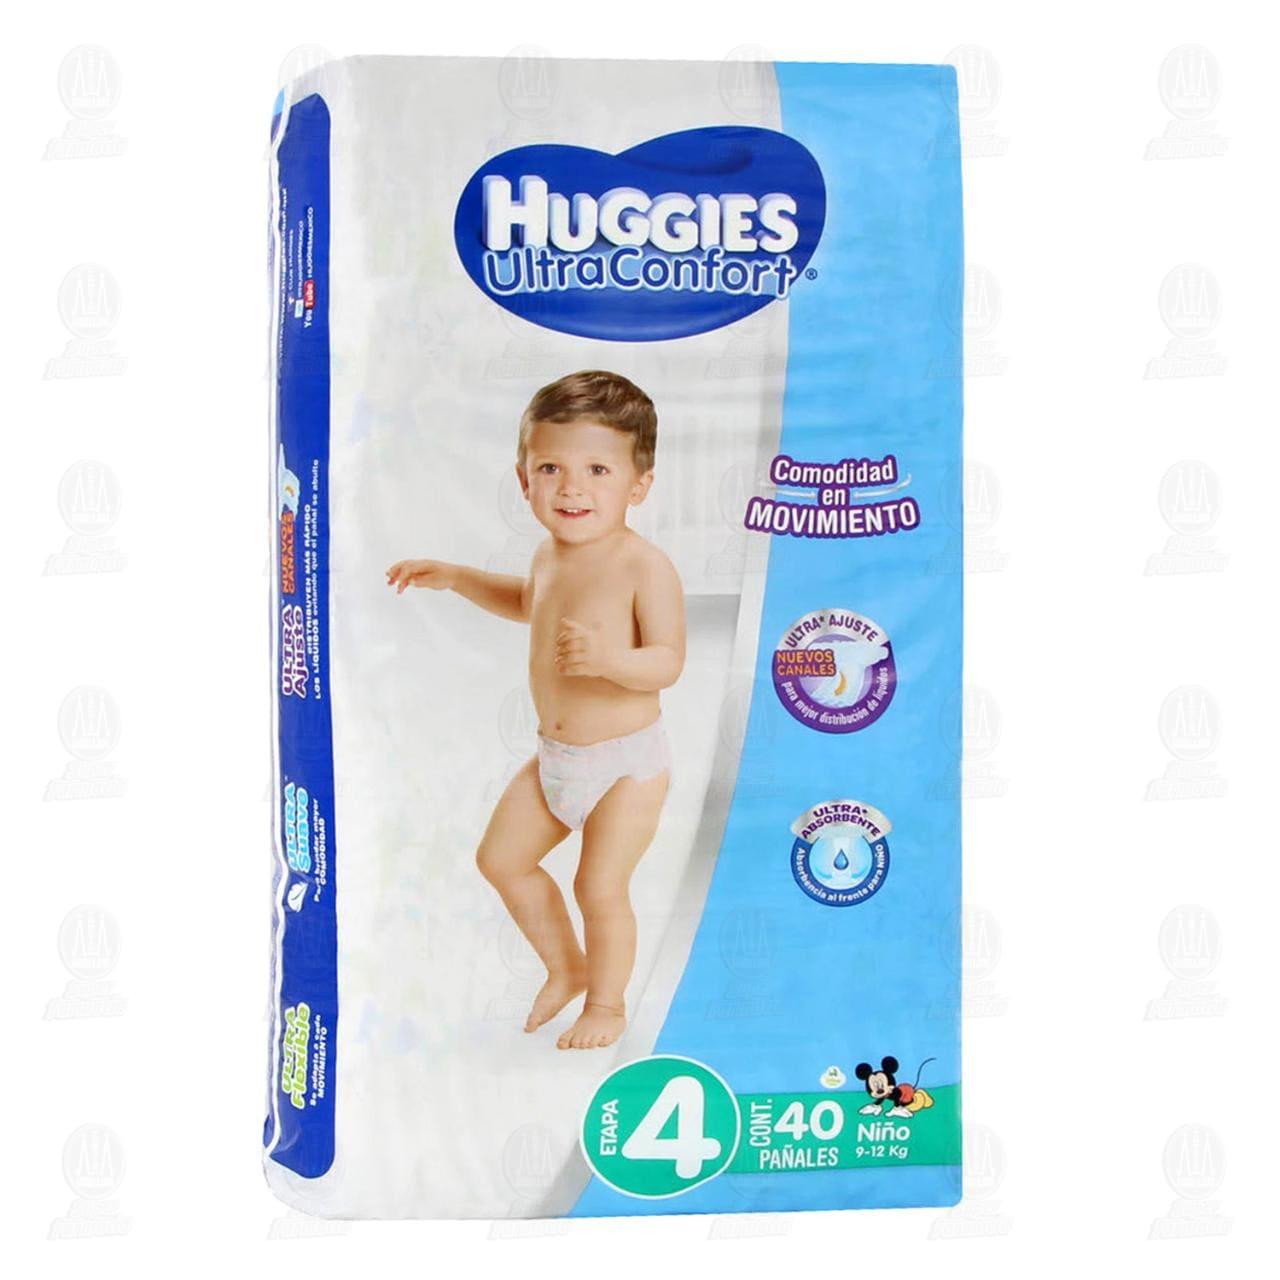 Pañales Huggies UltraConfort para Niño Etapa 4, 40 pzas.